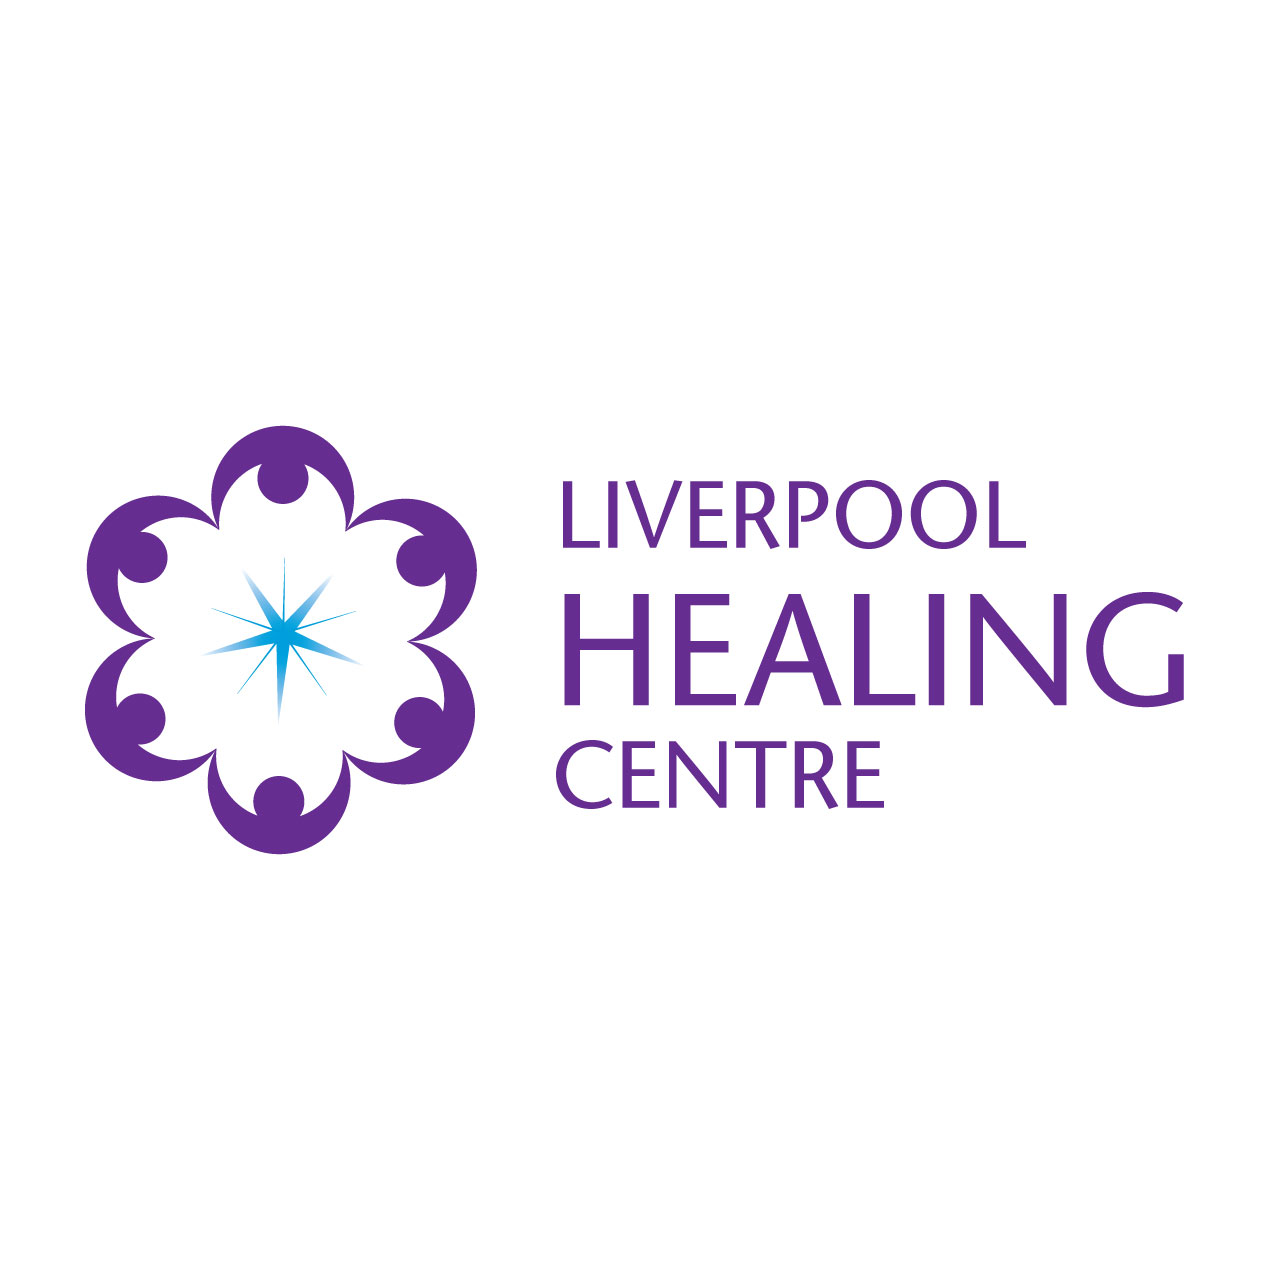 Liverpool Healing Centre logo